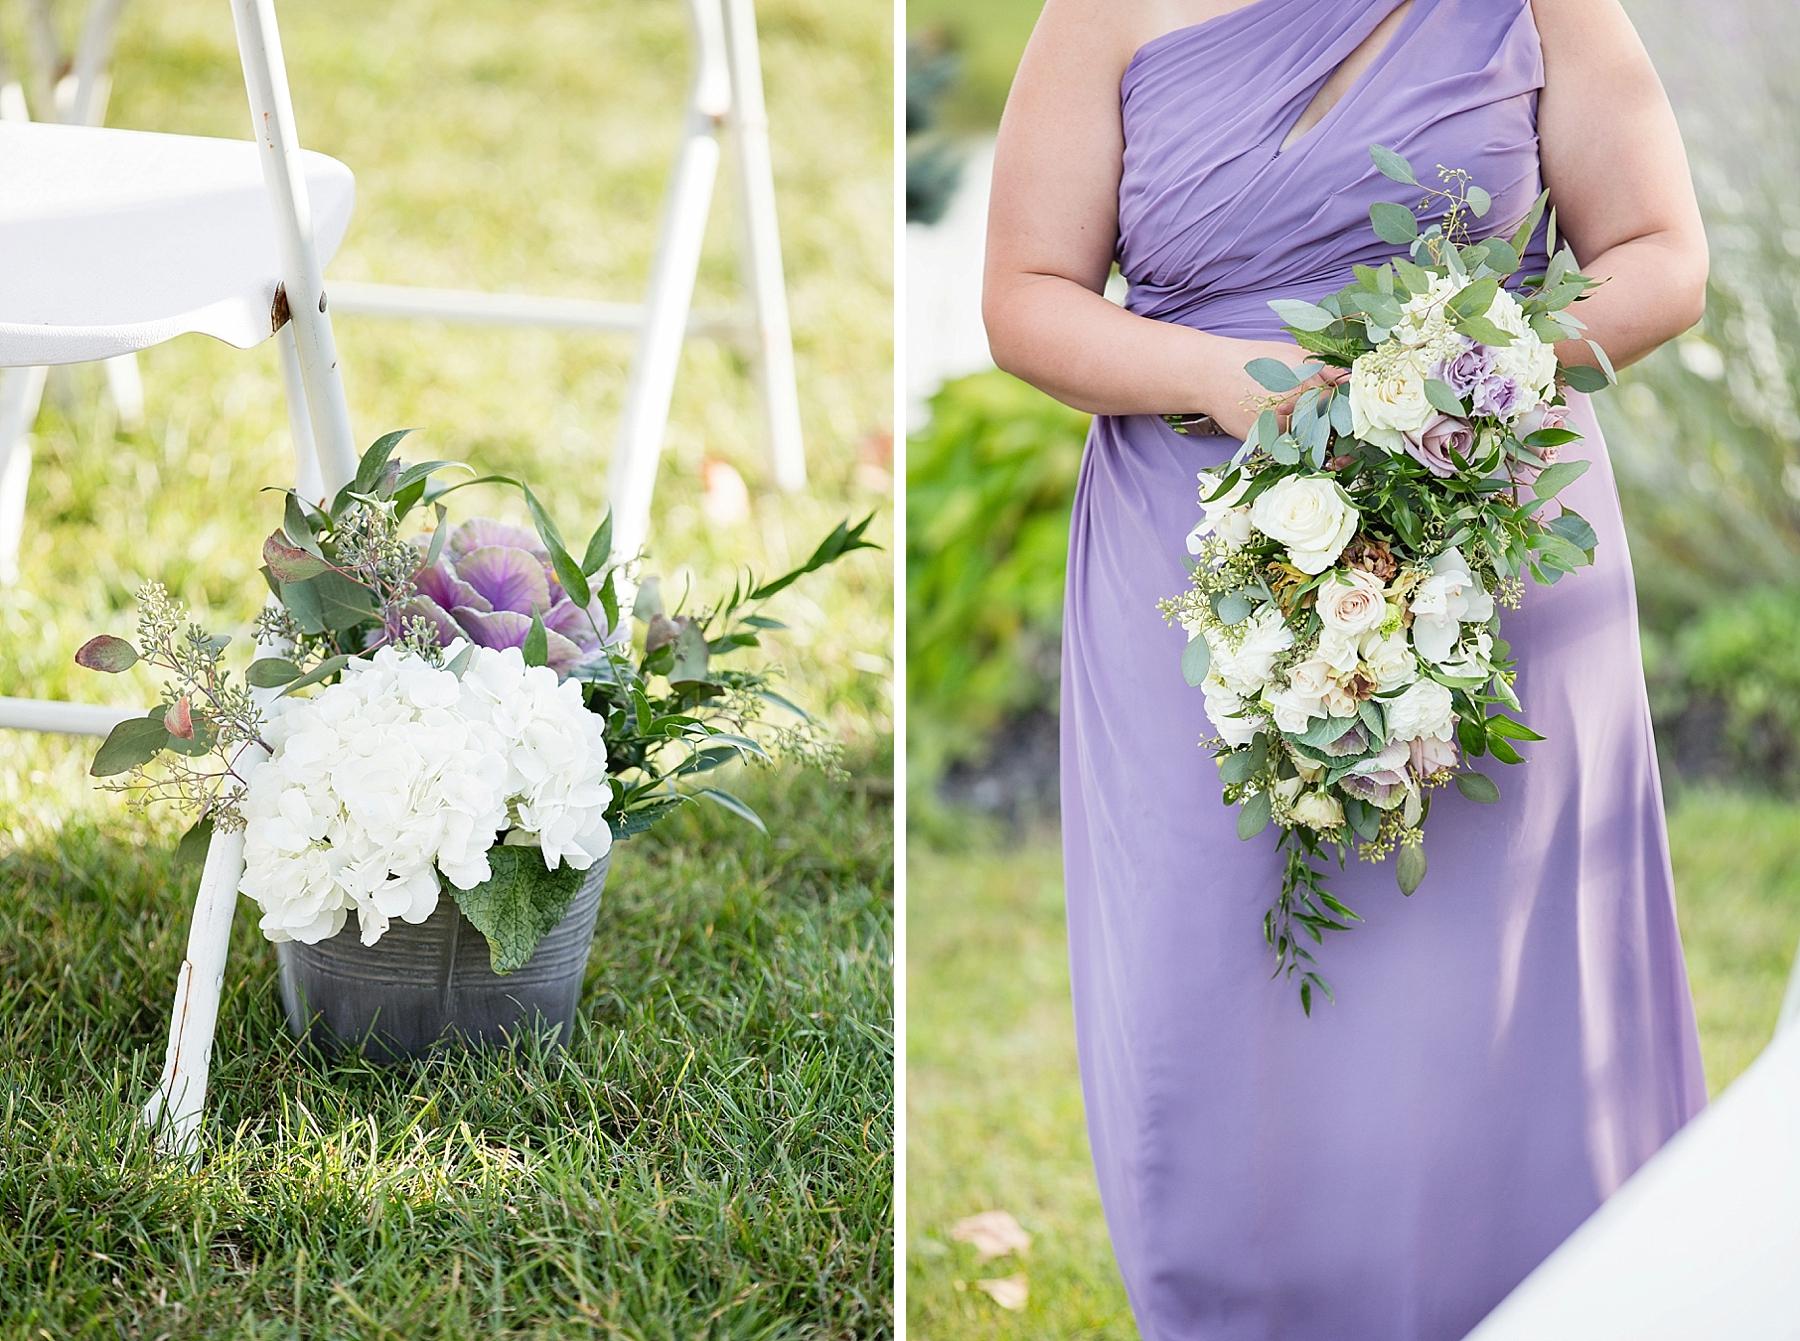 windsor-wedding-photographer-sprucewood-shores-winery-wedding-niagara-on-the-lake-wedding-photographer-eryn-shea-photography_0047.jpg